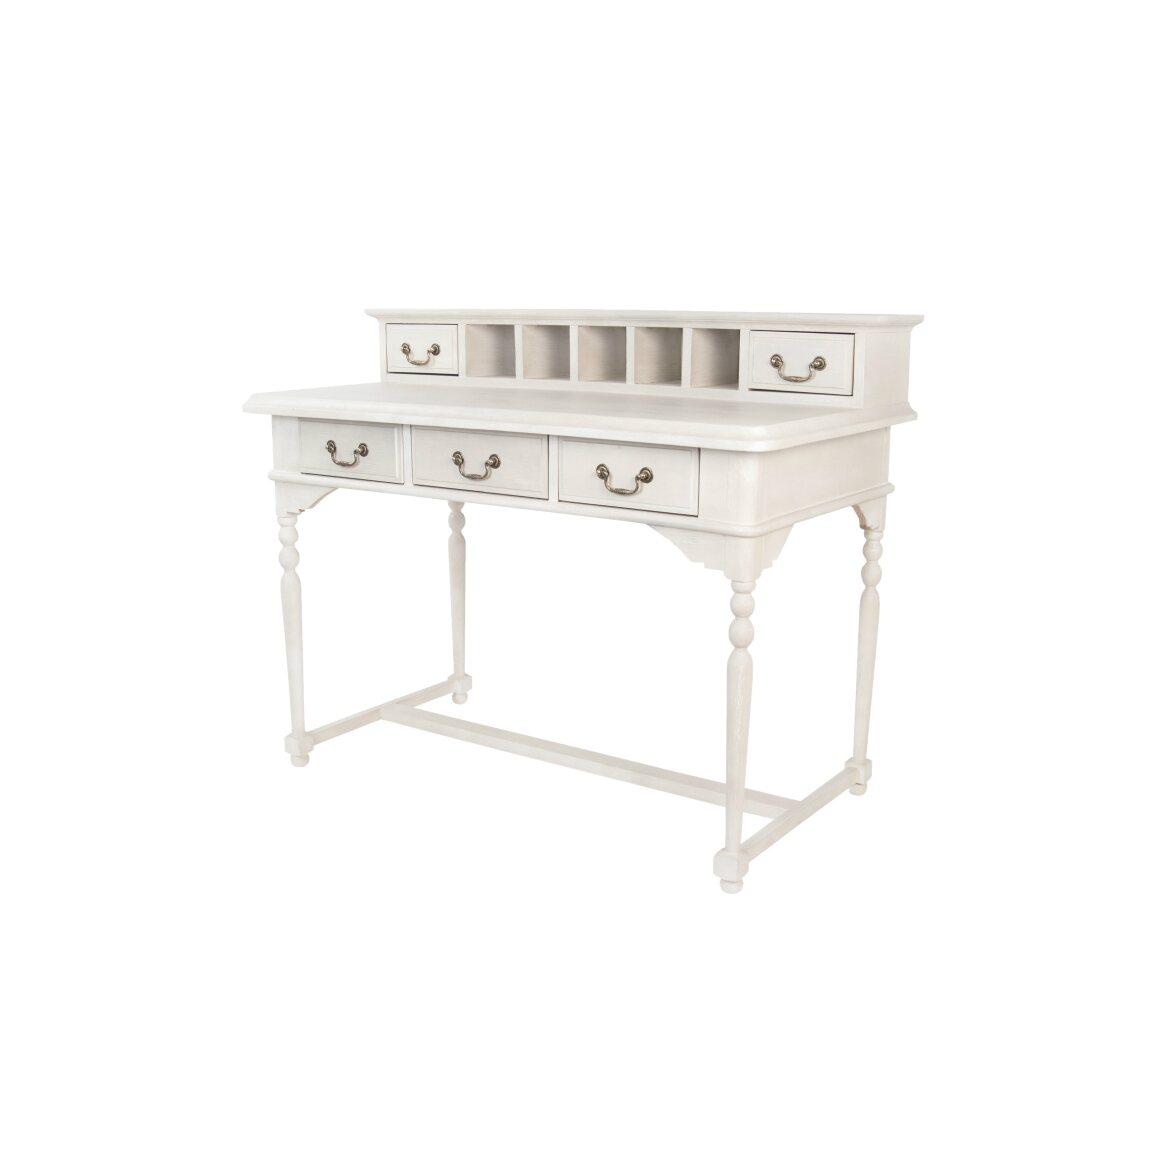 Письменный стол Sinley 2 | Письменные столы Kingsby